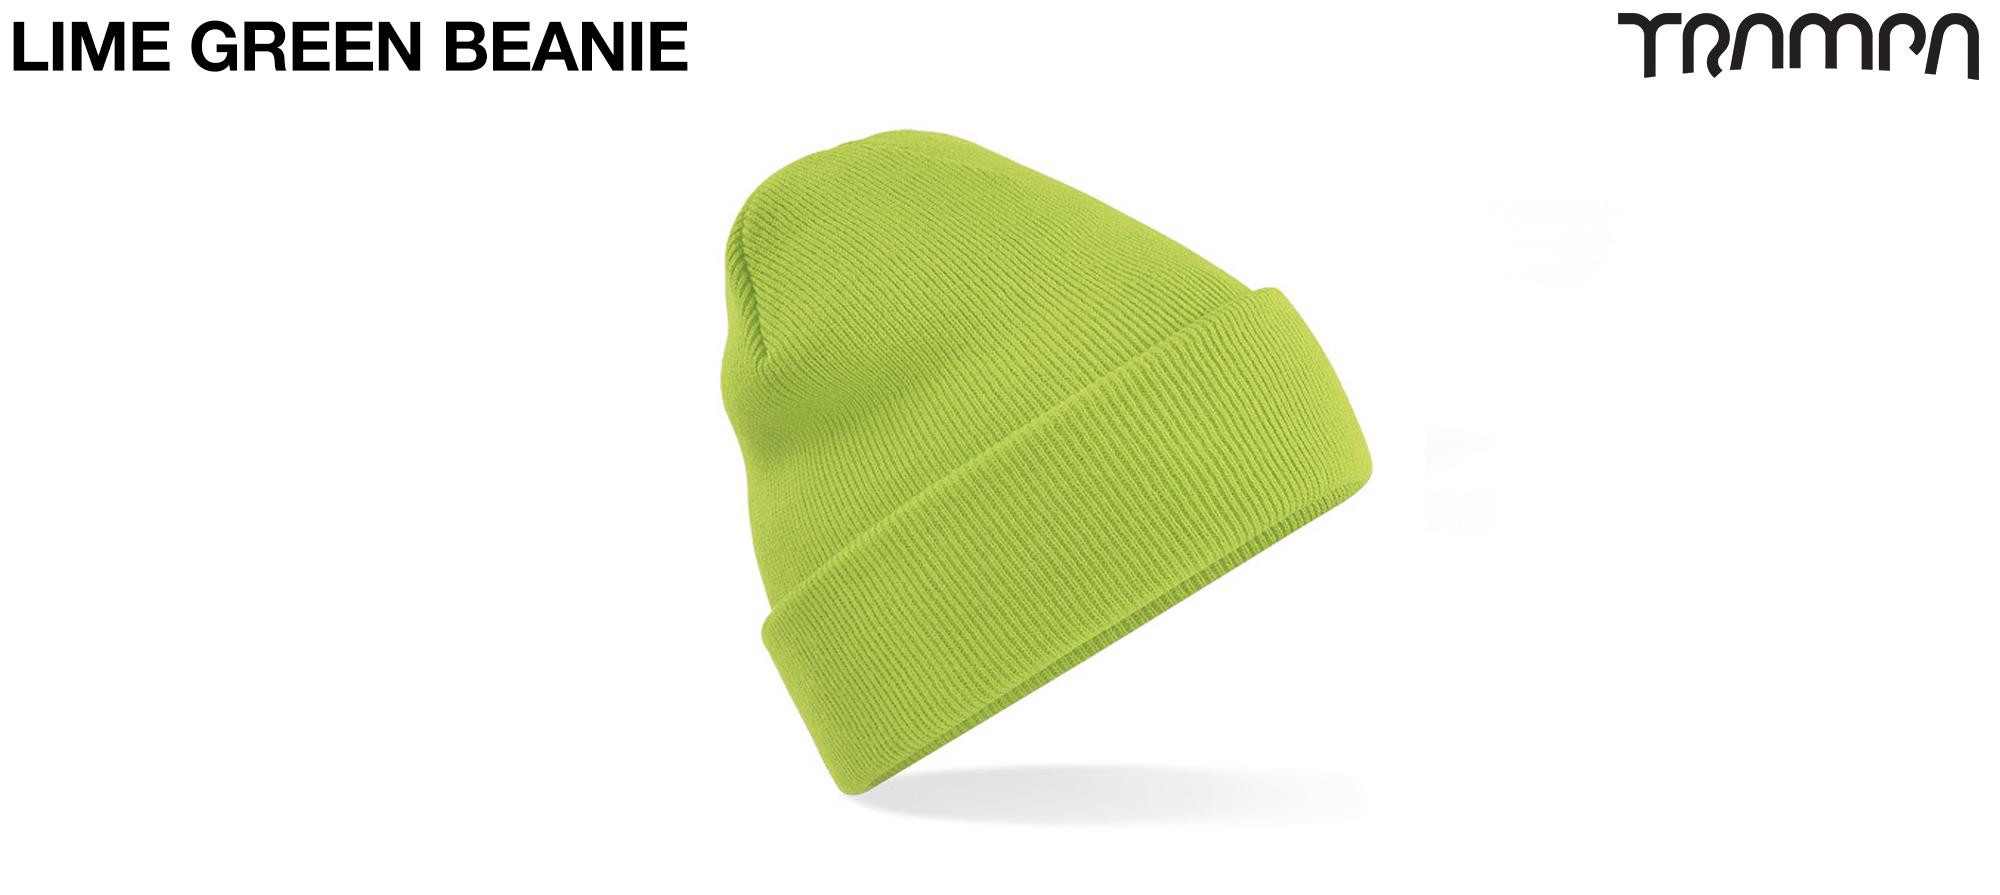 Wooli Hat Turn up - LIME